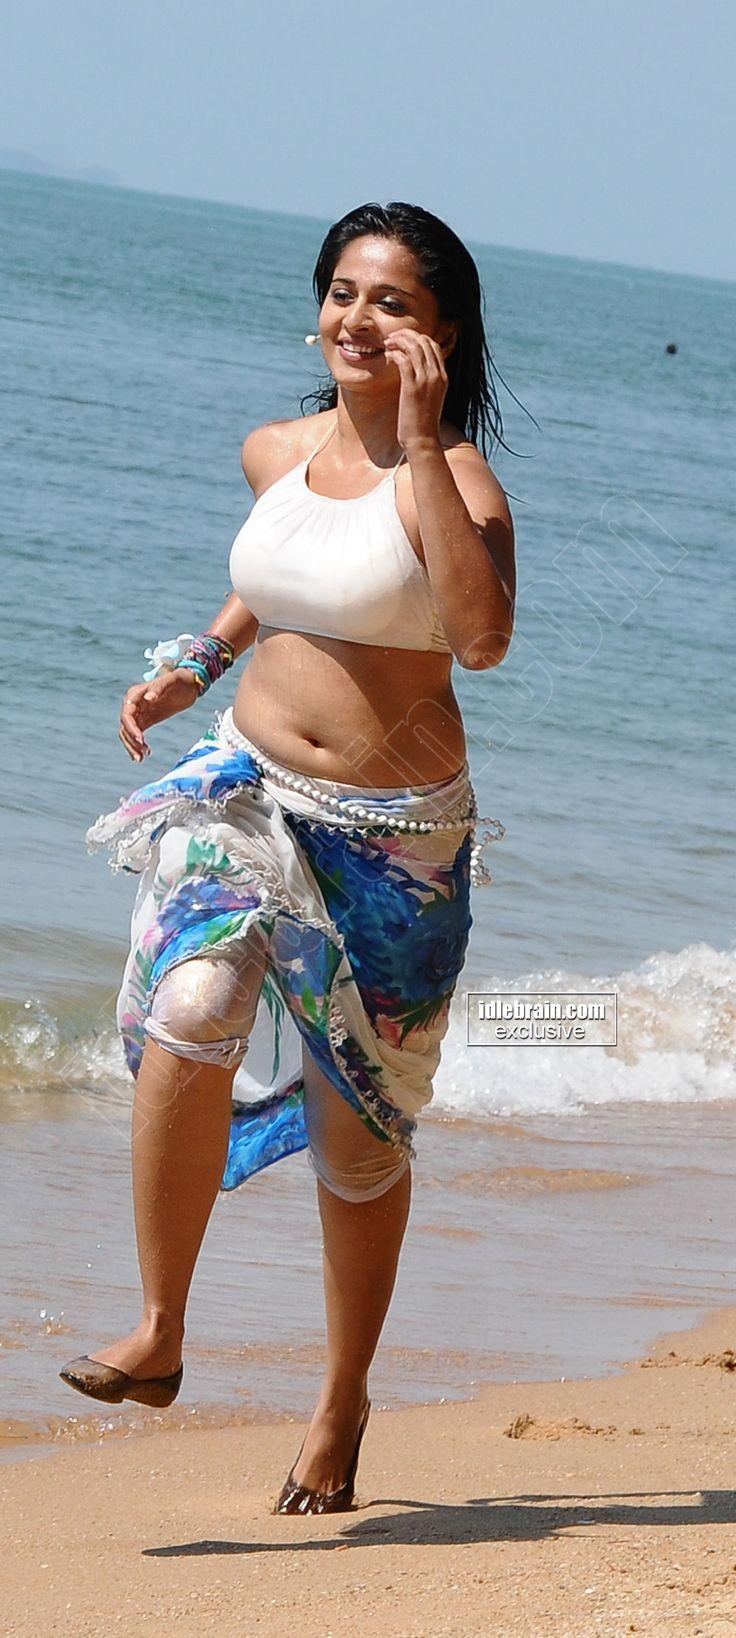 Tempting Actress Picks [25 lakh views] - Page 76 - Xossip